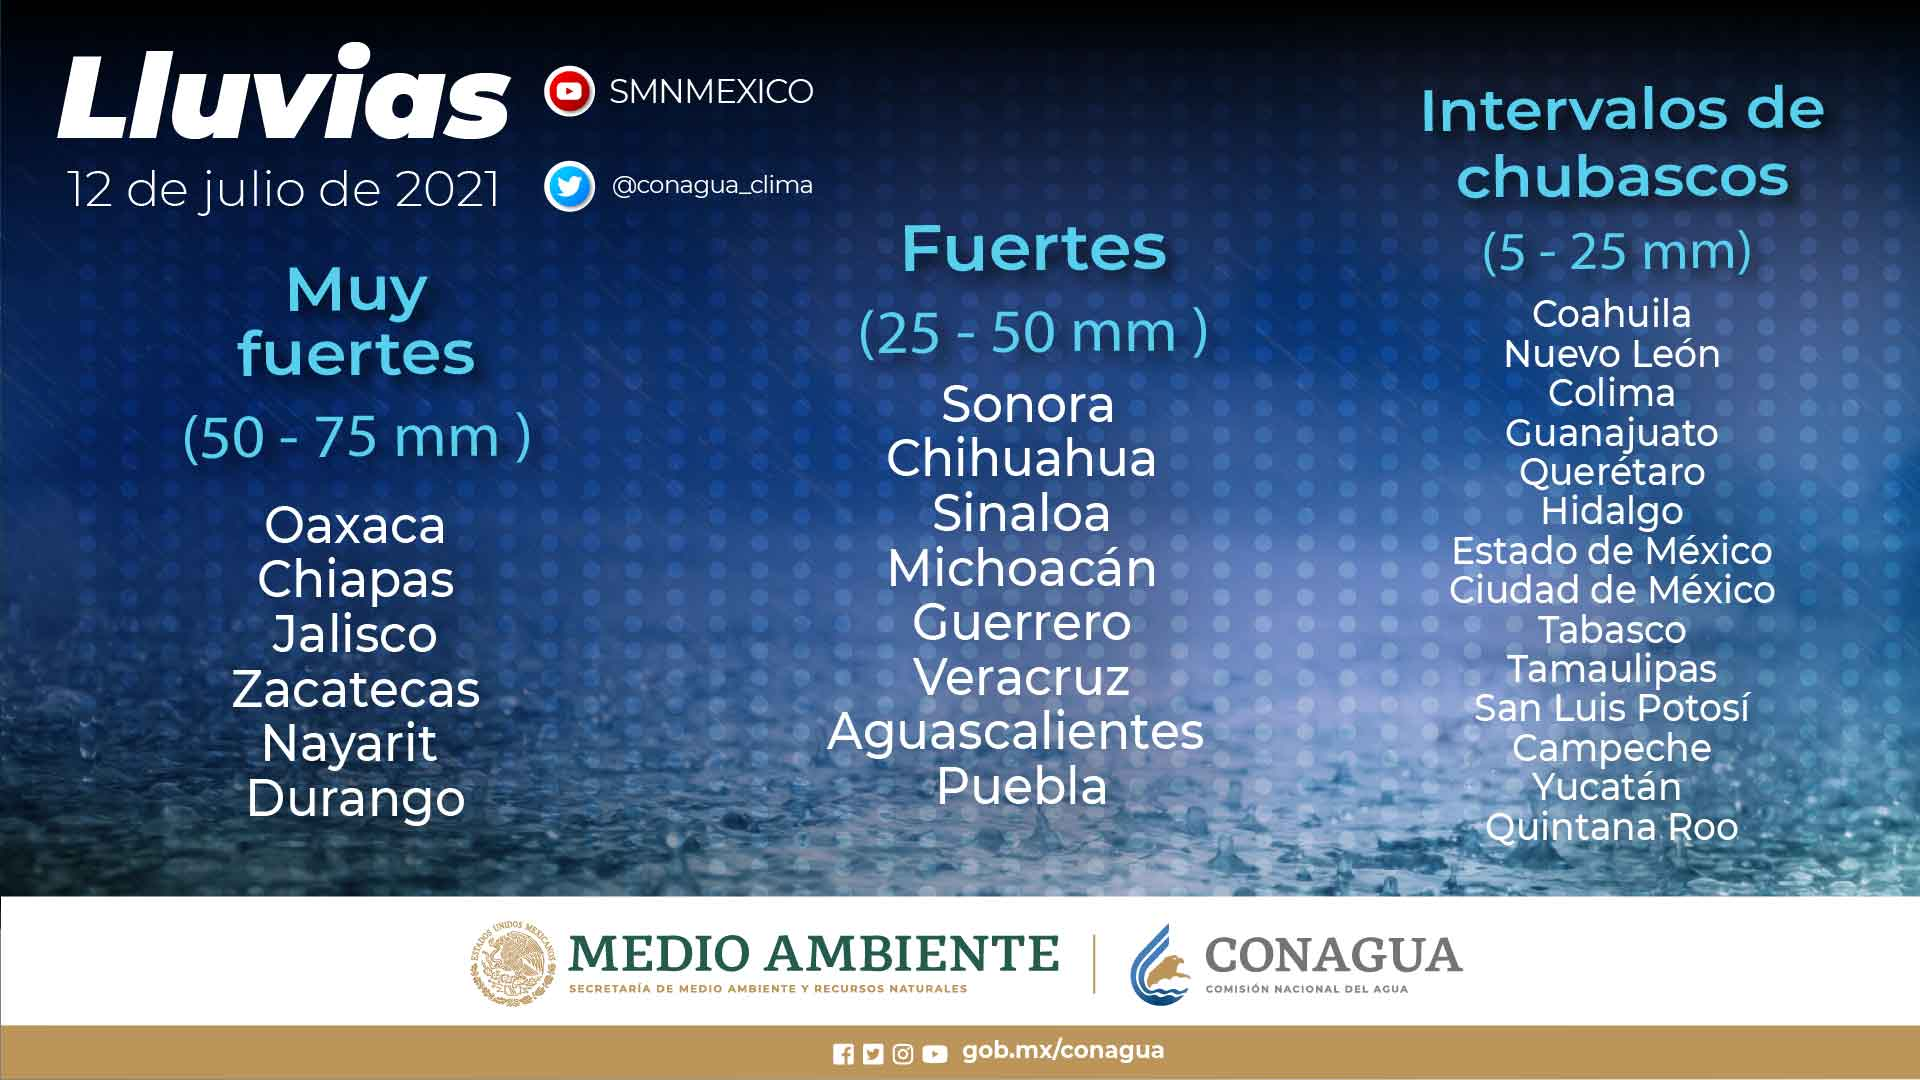 Continuarán las lluvias fuertes para Tlaxcala esta semana